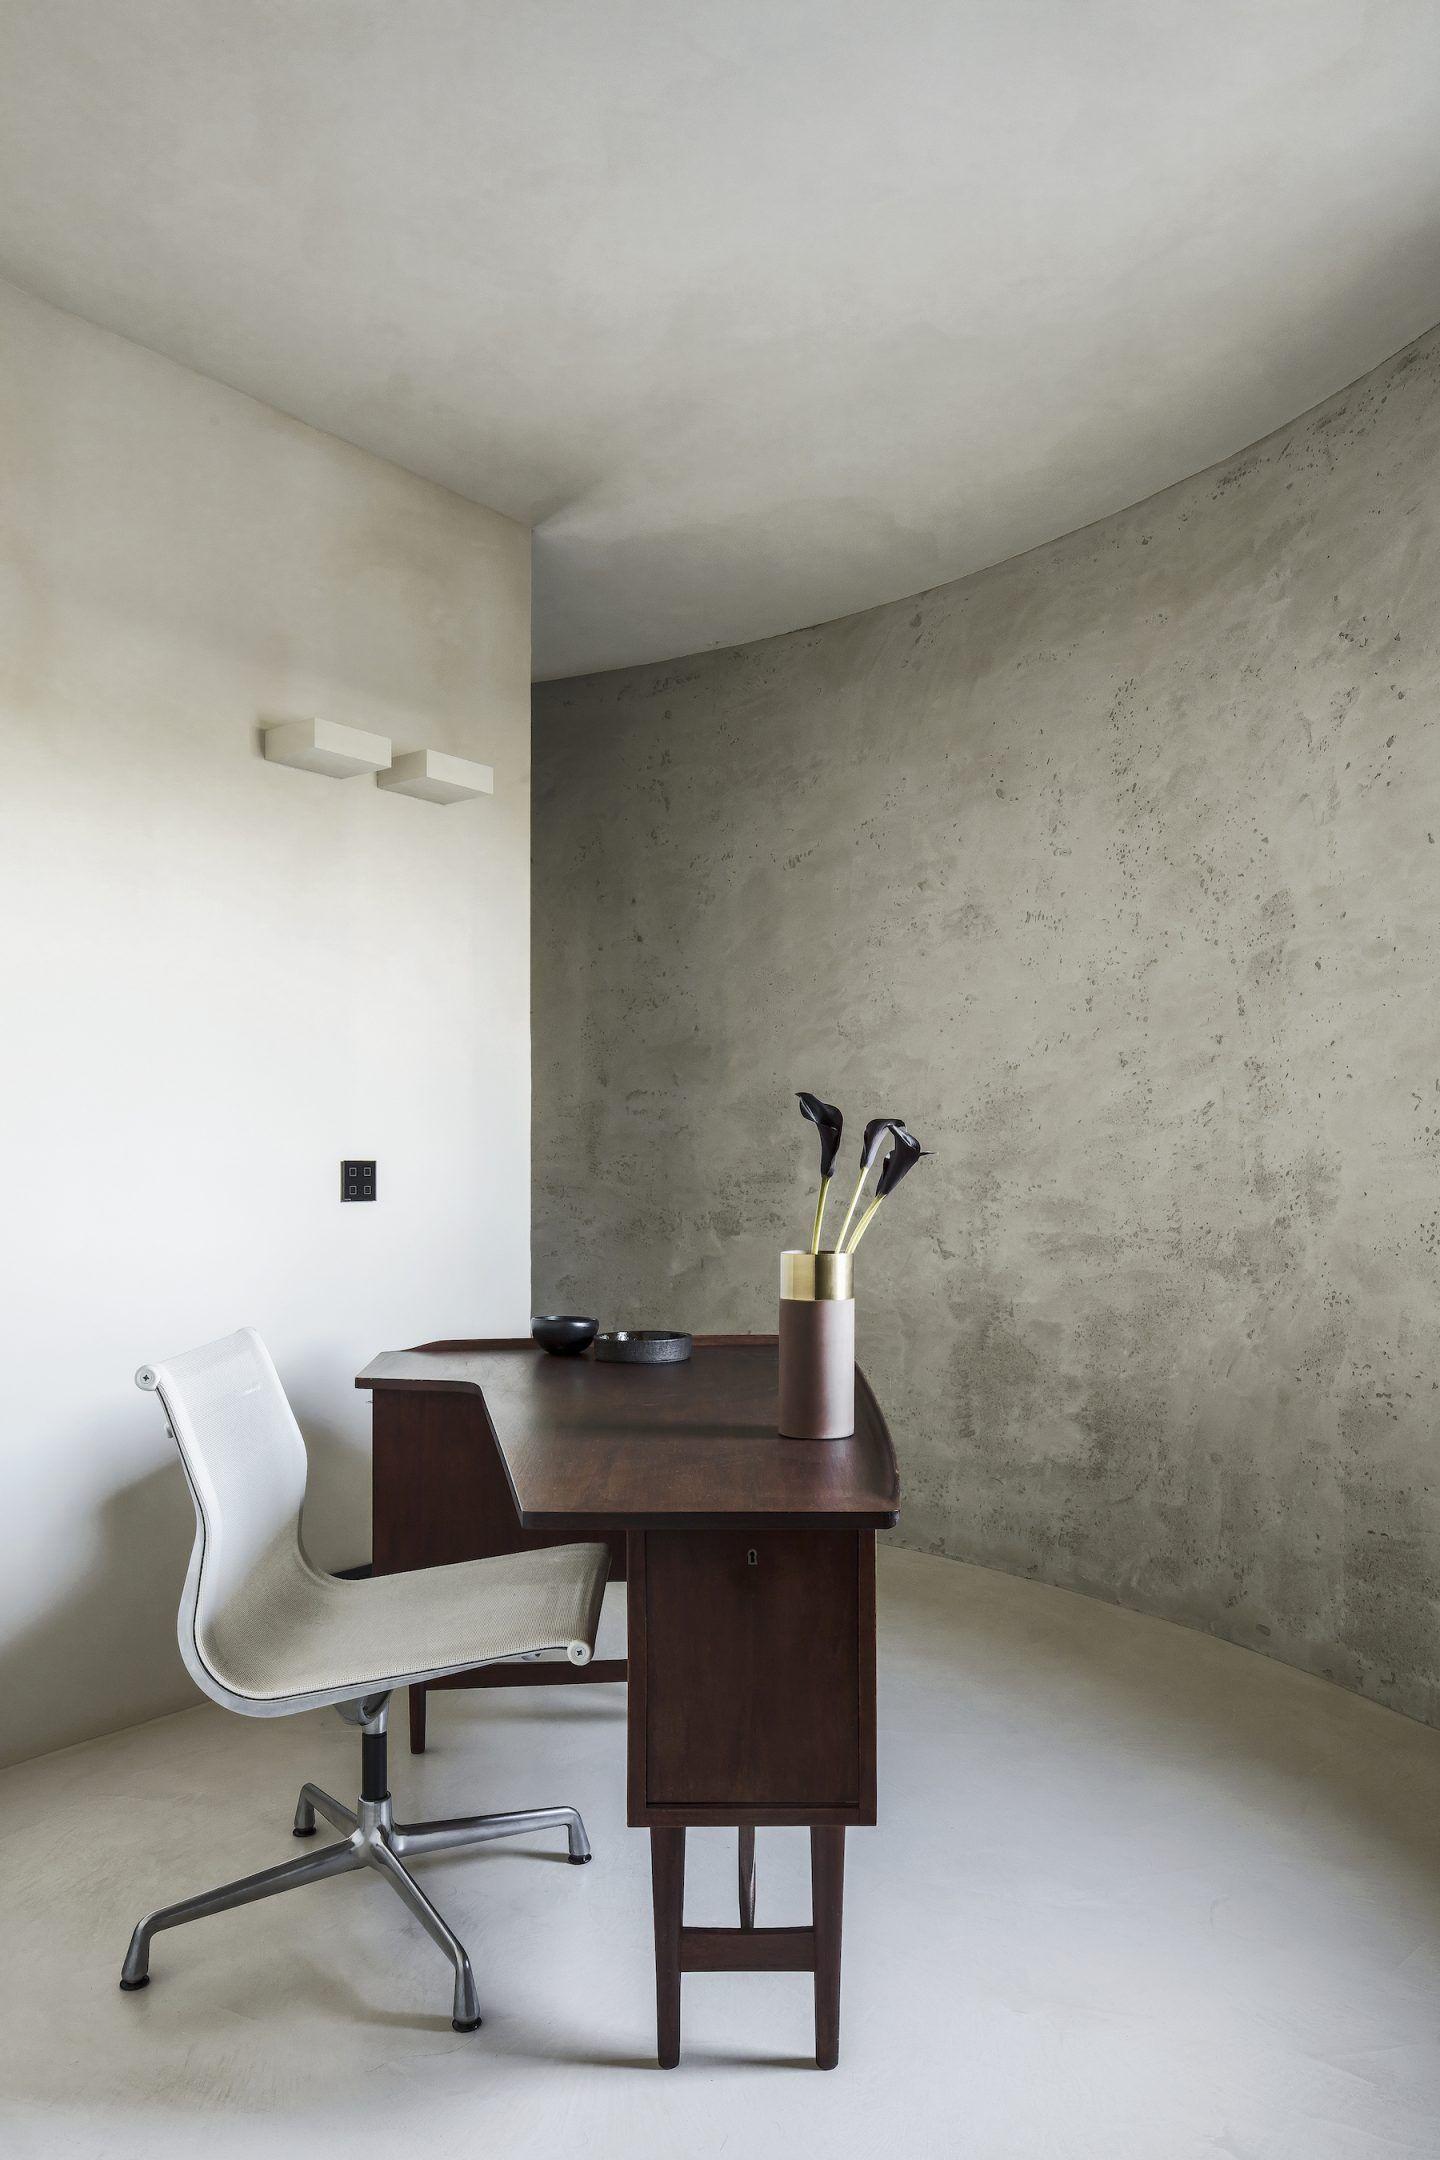 IGNANT-Architecture-Arjaan-De-Feyter-Silo-Apartment-16